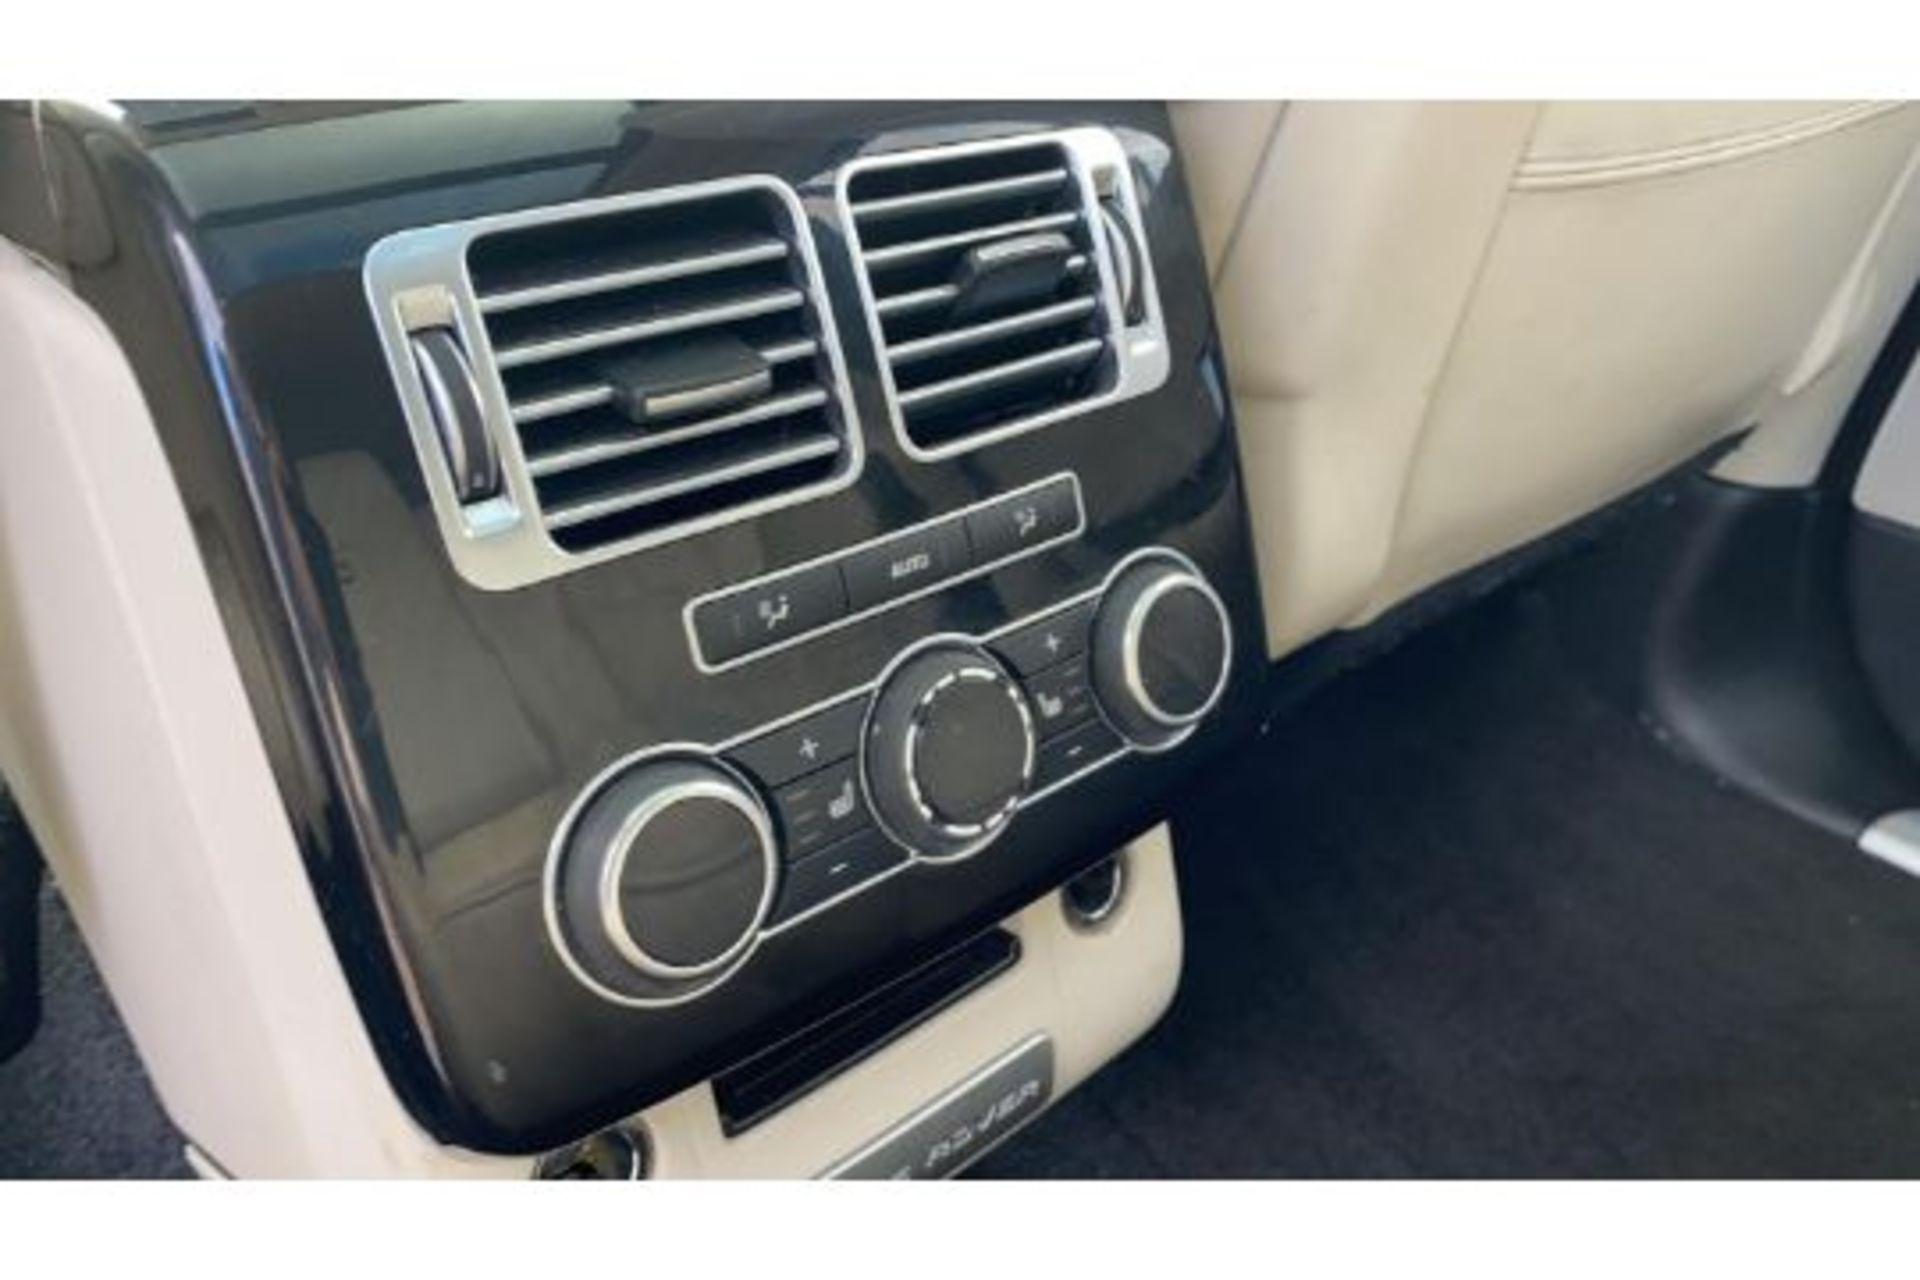 Range Rover Vogue 3.0 TDV6 SE Auto - Black Pack - NEW SHAPE - FULLY LOADED - Pan Roof - Image 20 of 30